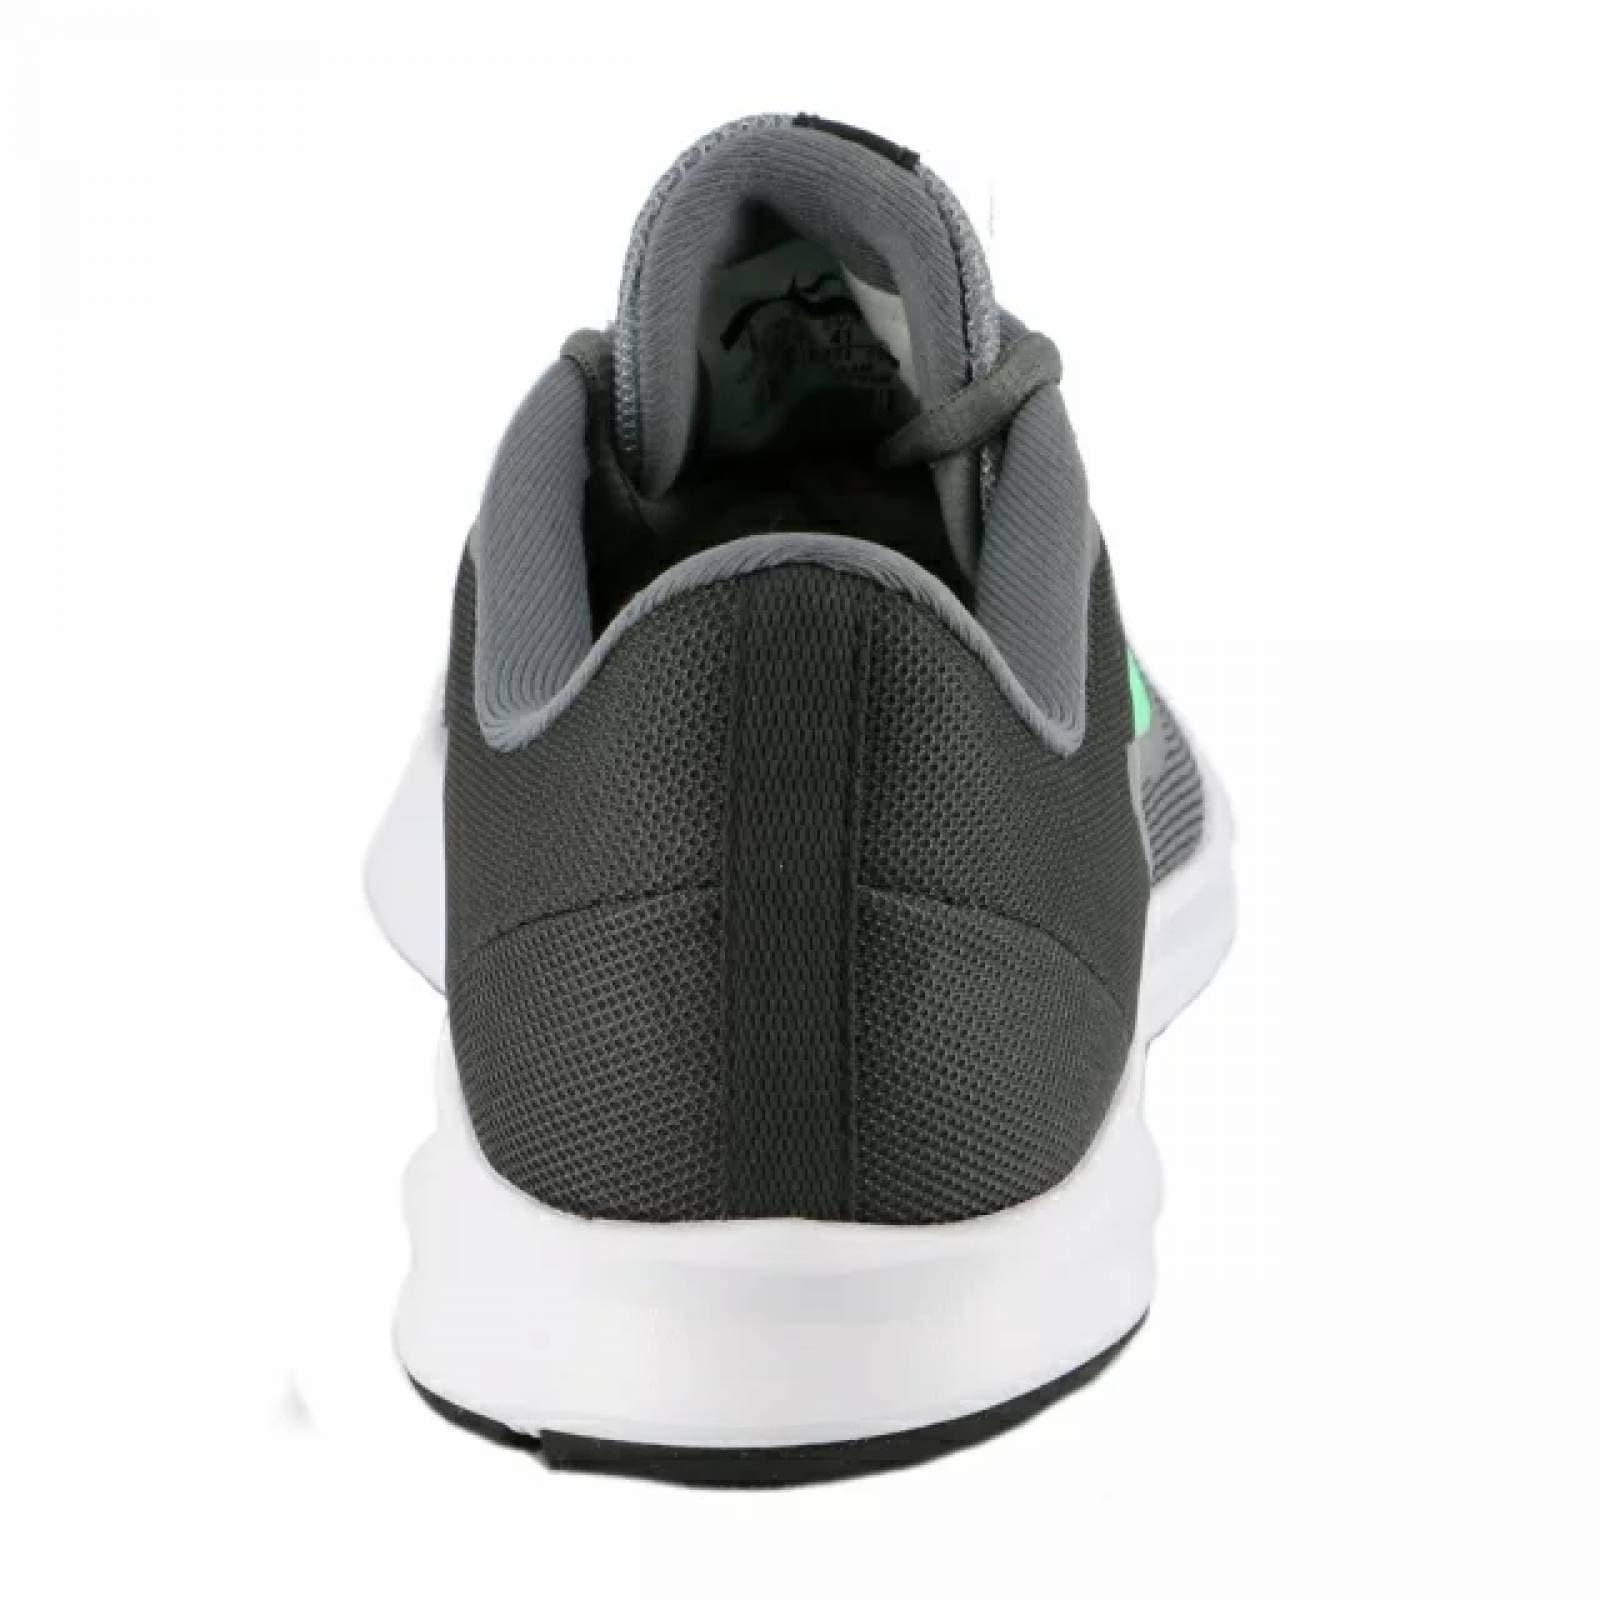 Tenis Nike Downshifter 9 Hombre Running Training Deportivo